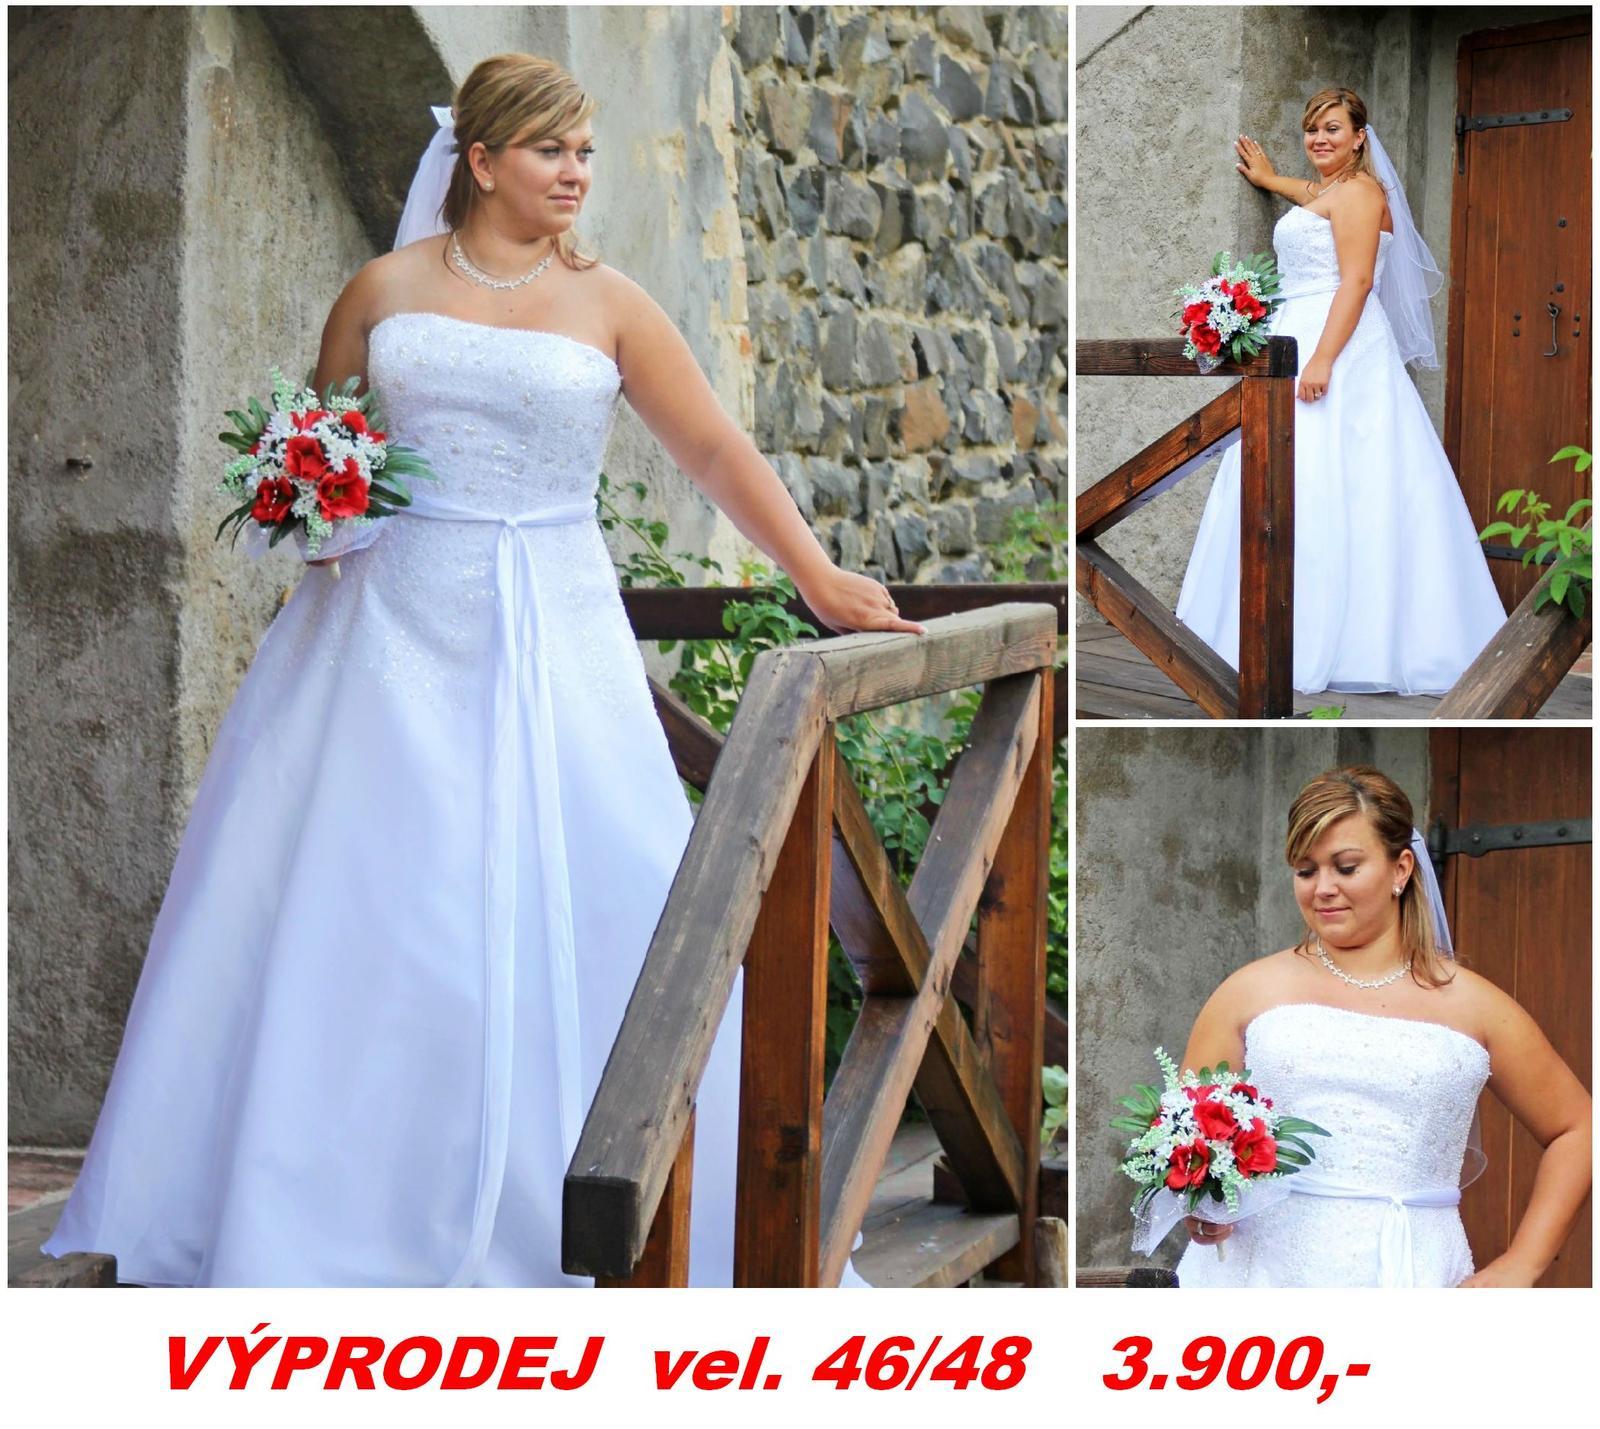 Svatební šaty xl vel. 44 -46 až 48 bca42c6def